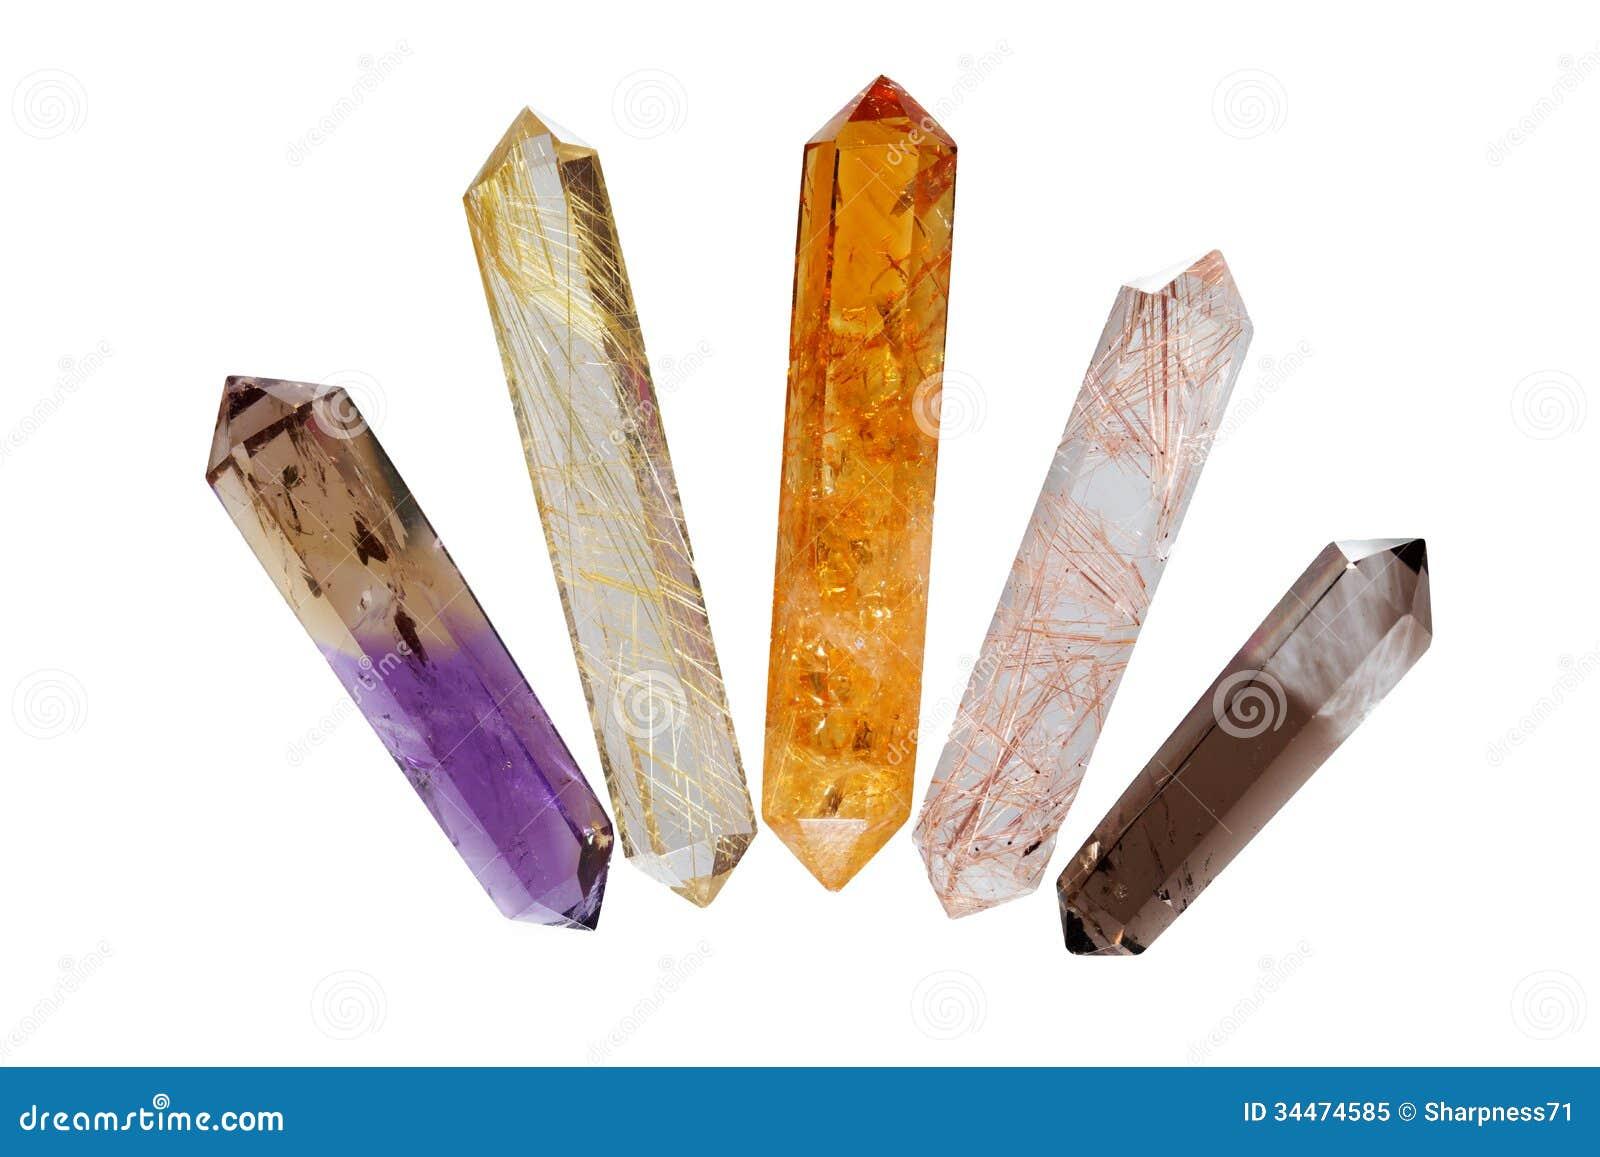 Several crystals 2